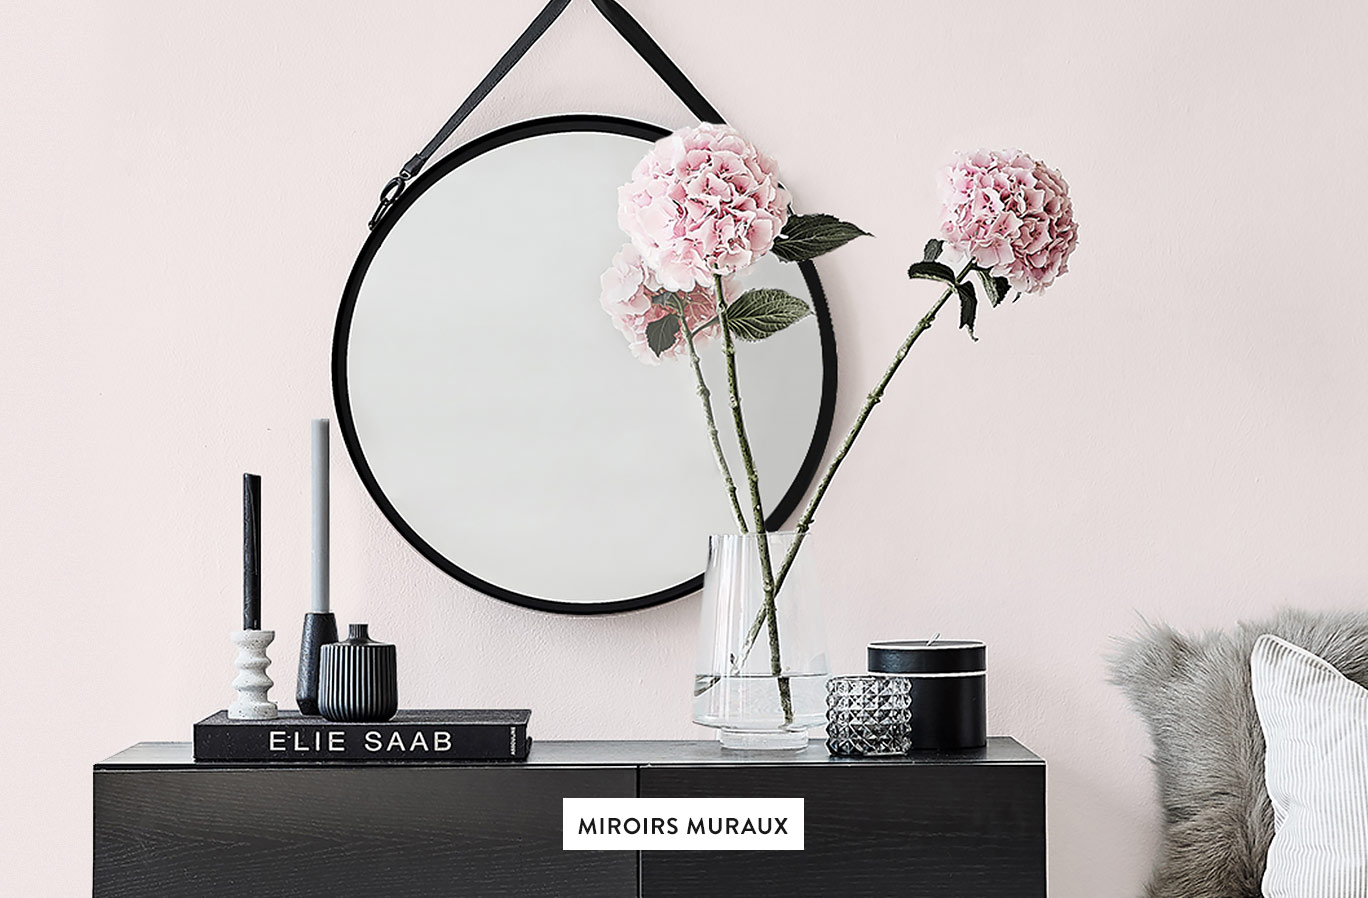 Spiegel-Wandspiegel-Deko